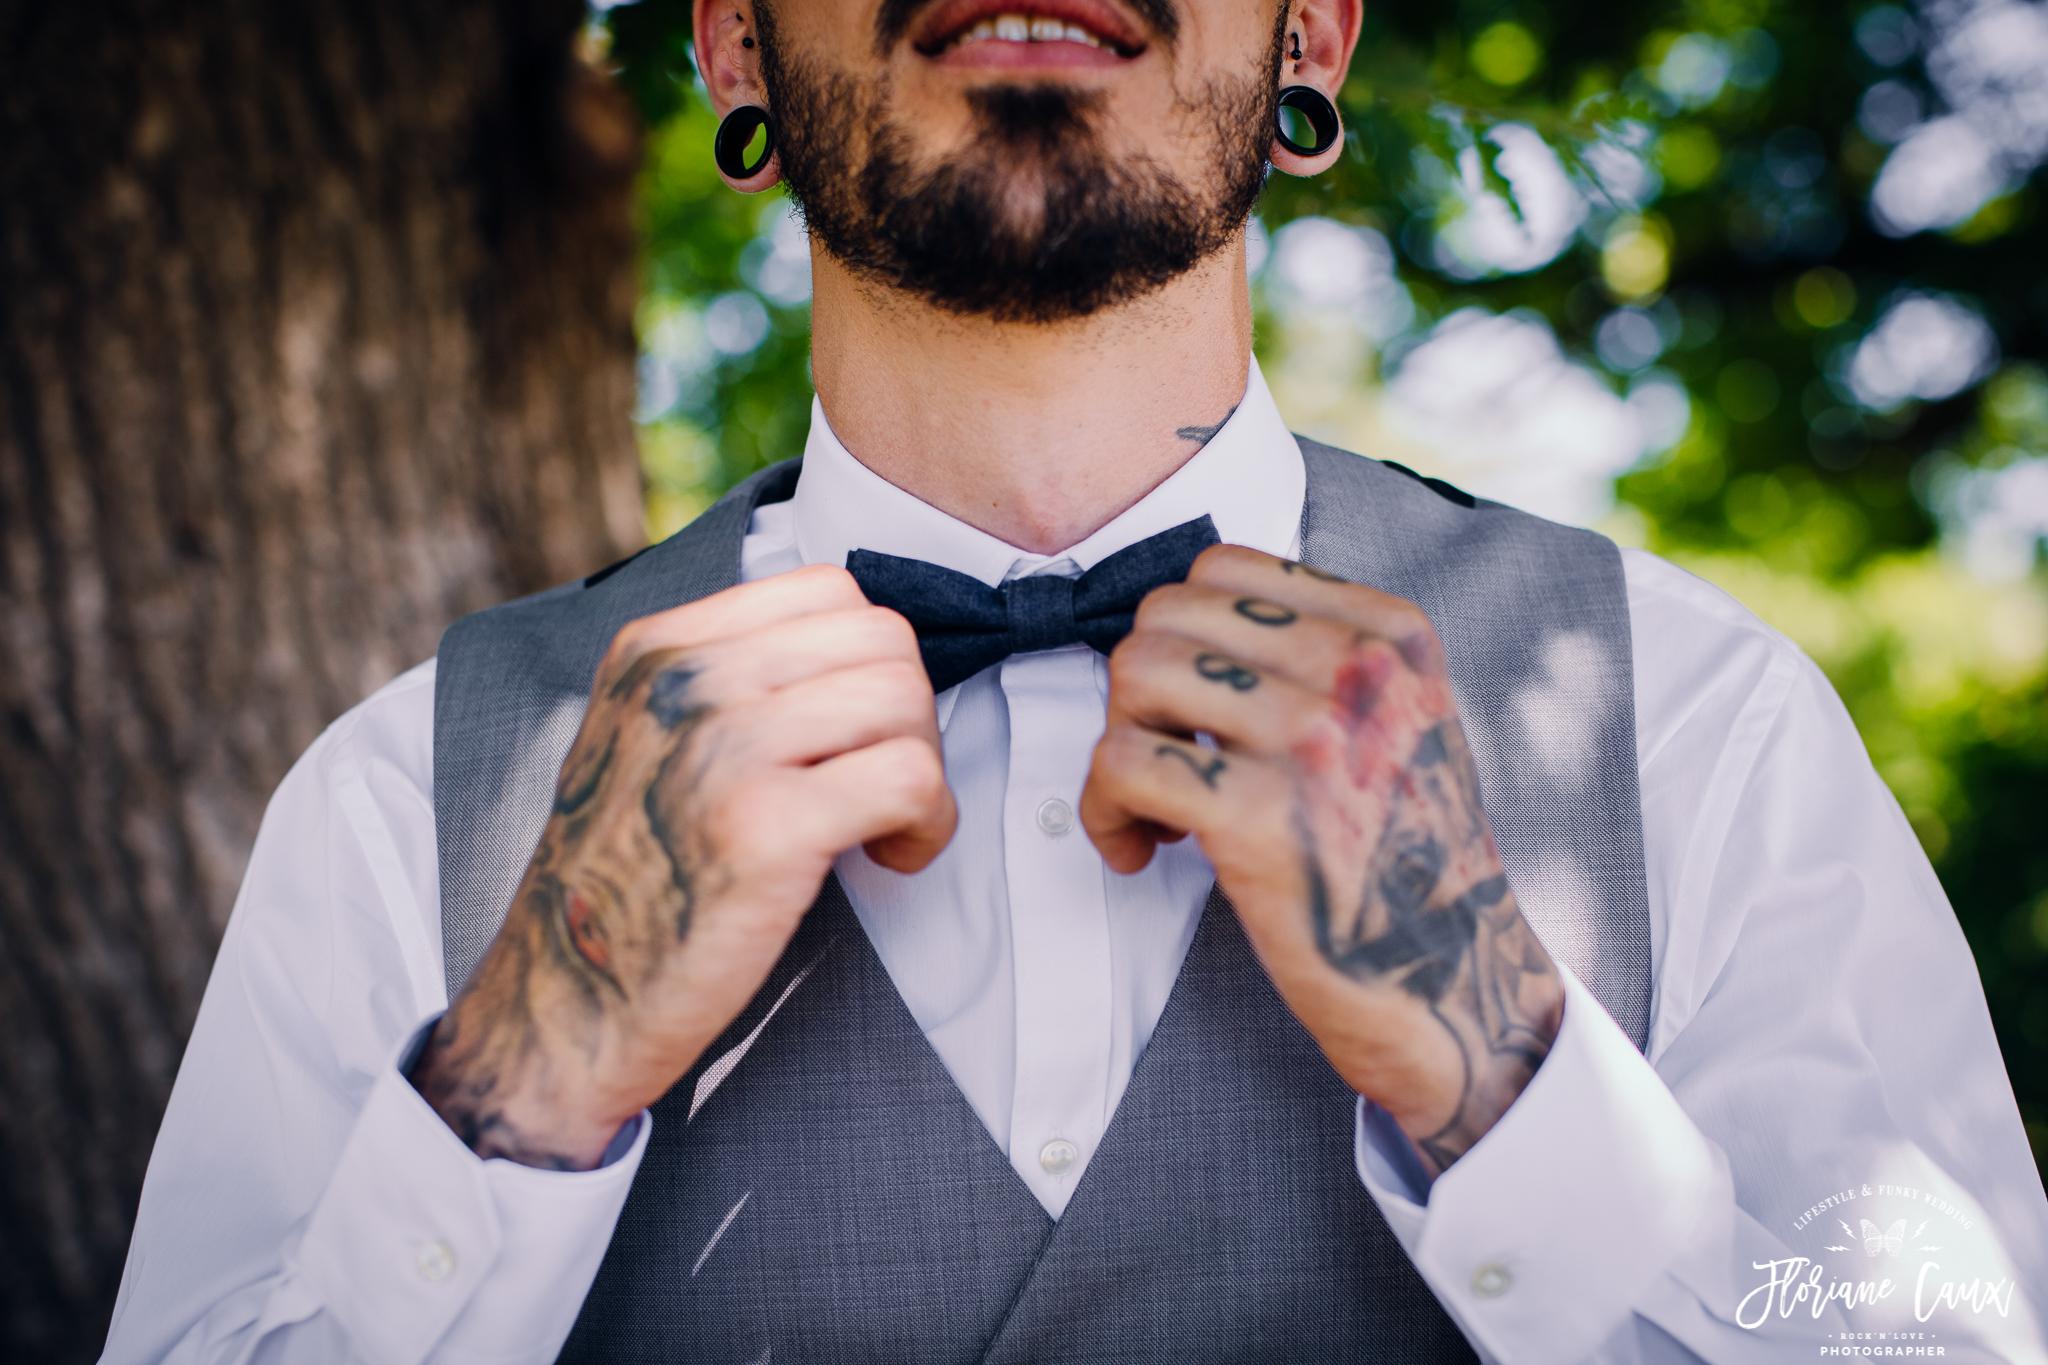 photographe-mariage-toulouse-rocknroll-maries-tatoues-floriane-caux-21